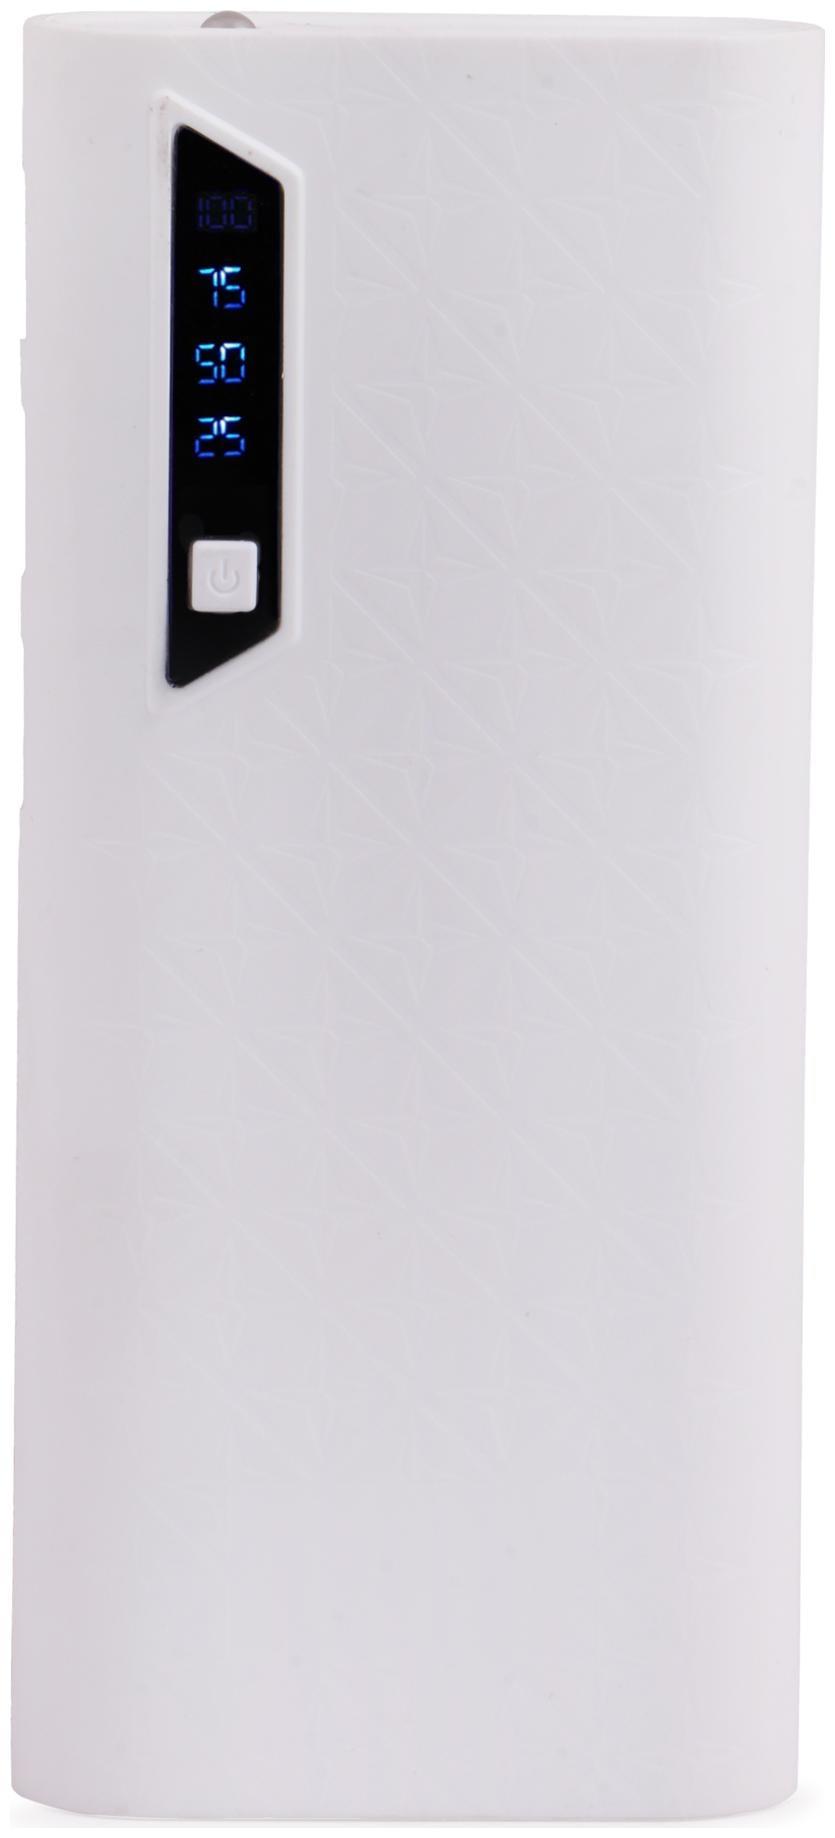 POMICS 15000 mAh Power Bank - White